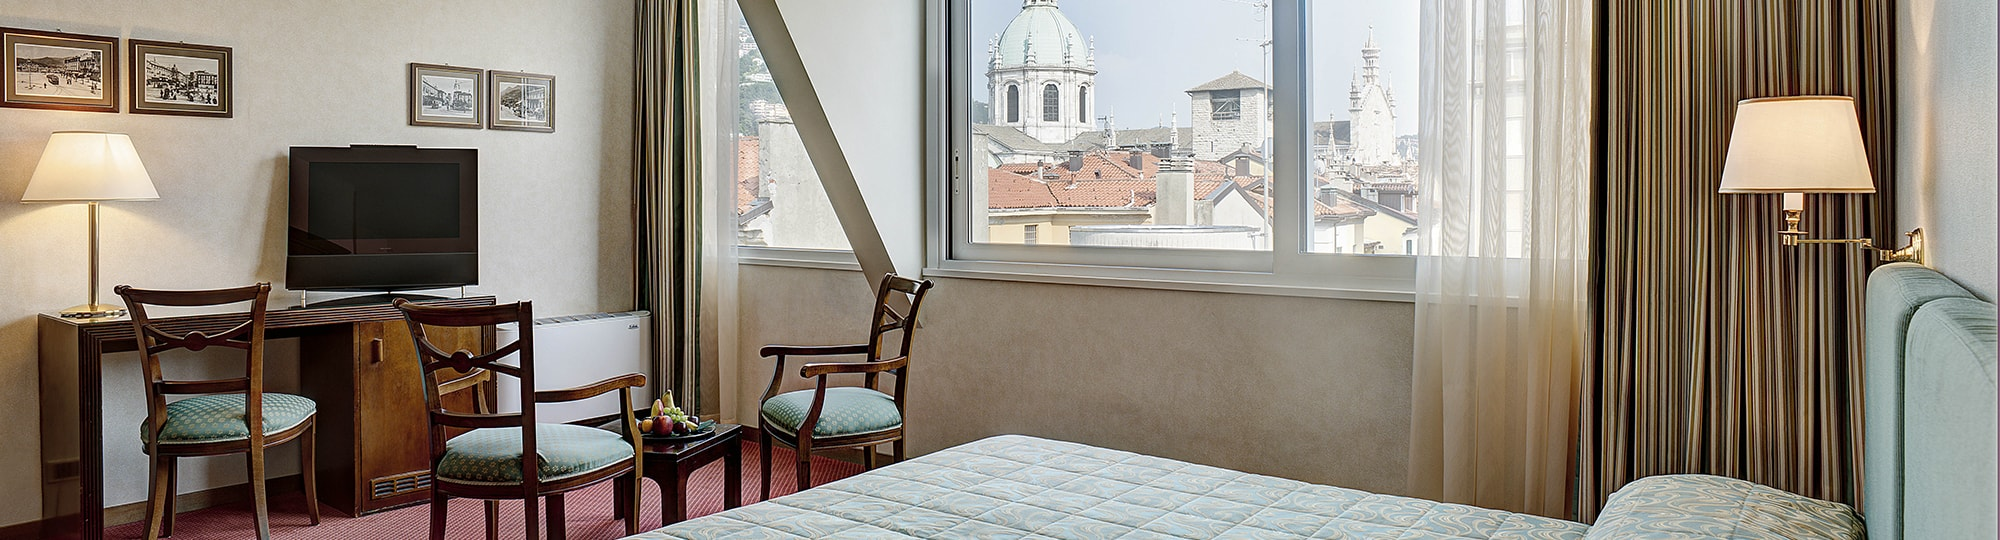 Vue de l'hotel Hotel Barchetta Excelsior 4* à Como